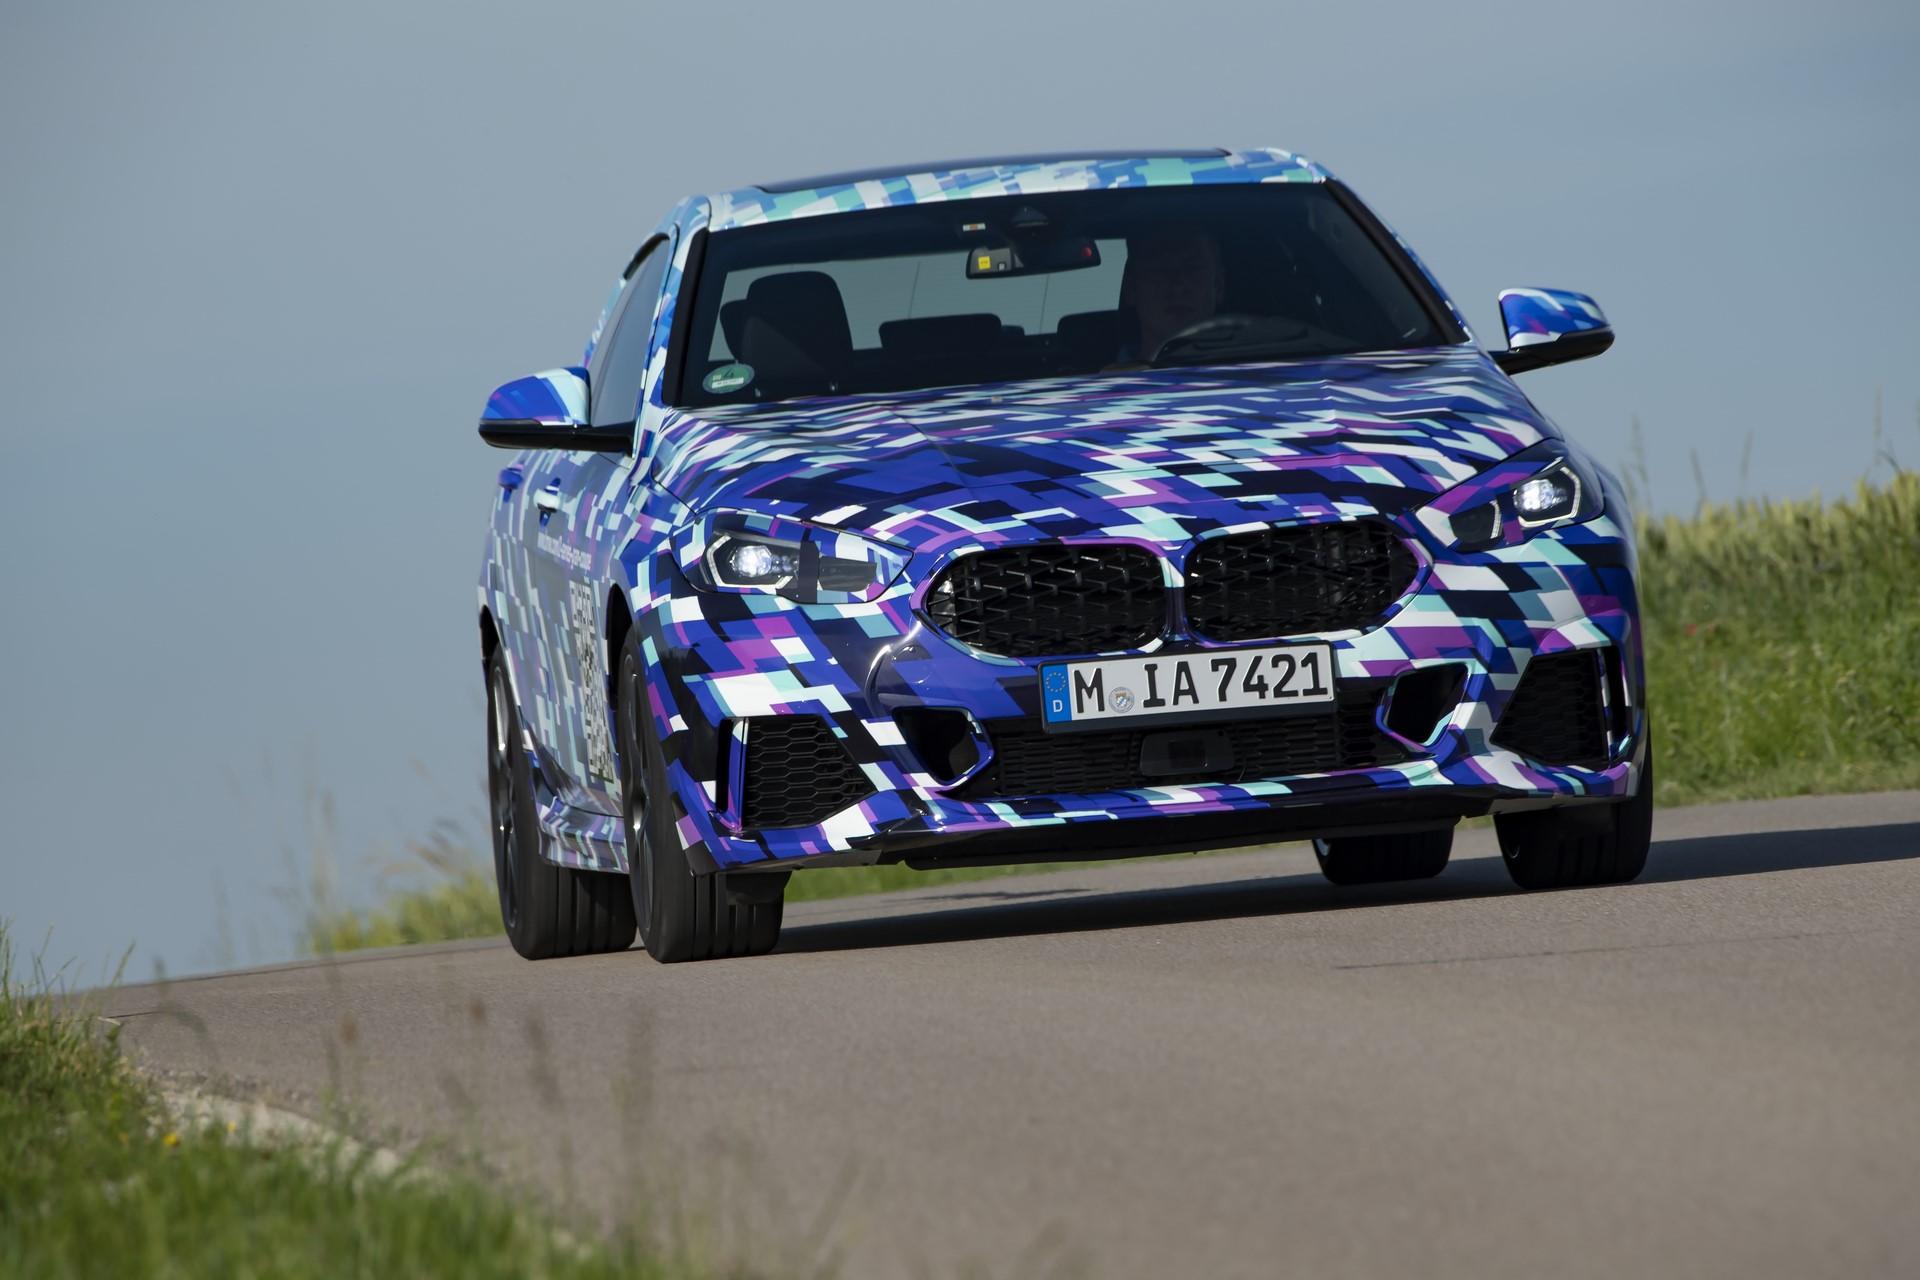 BMW-2-Series-Gran-Coupe-2020-spy-photos-1